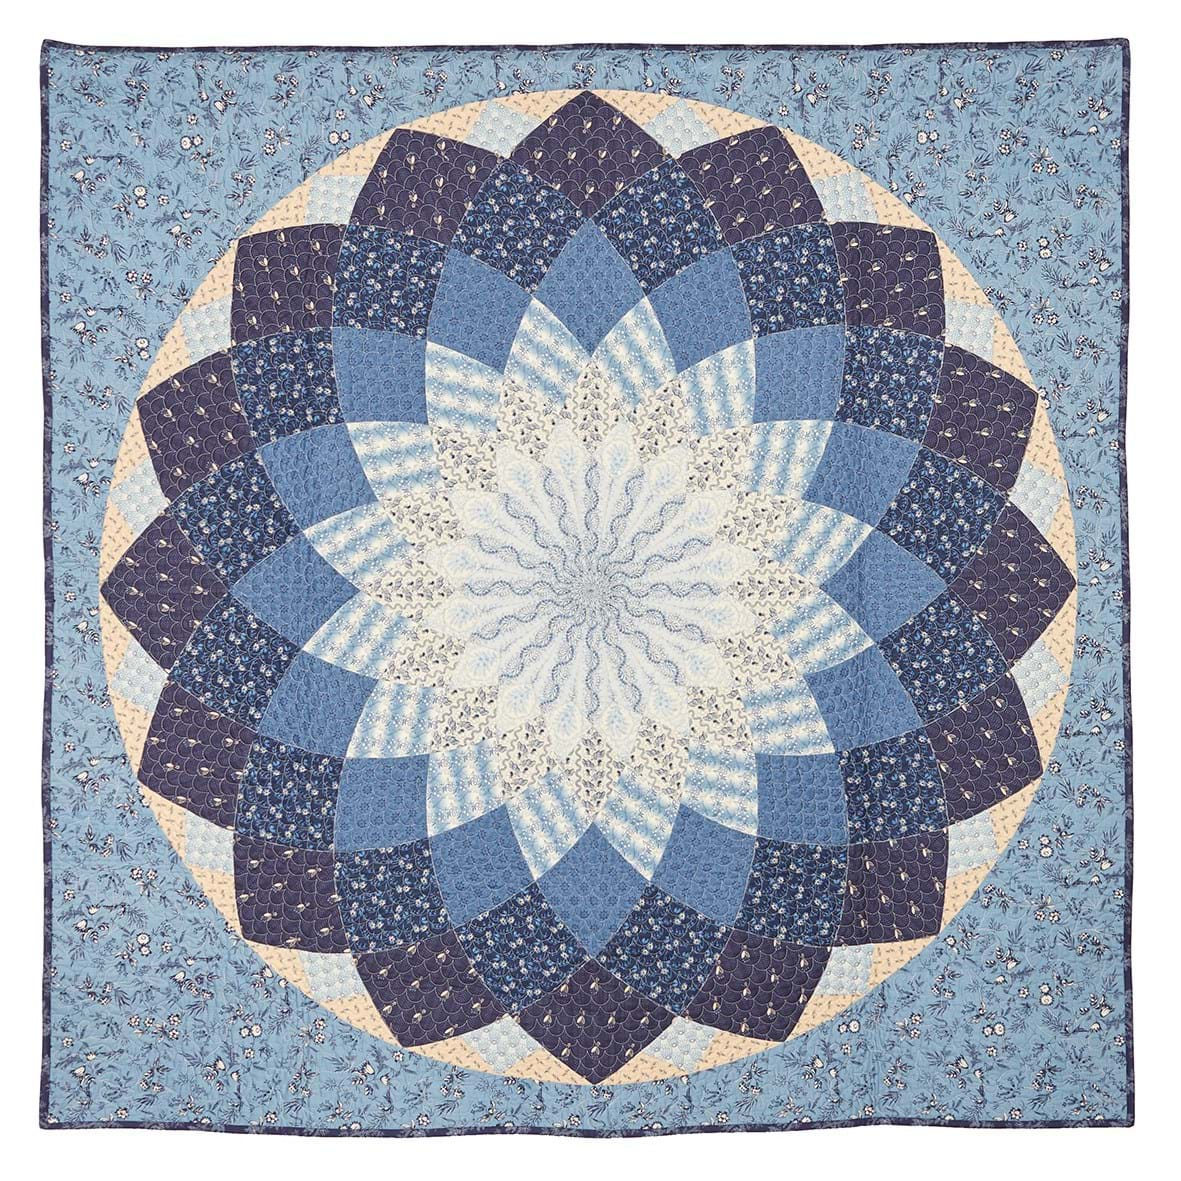 Giant Dahlia Pattern